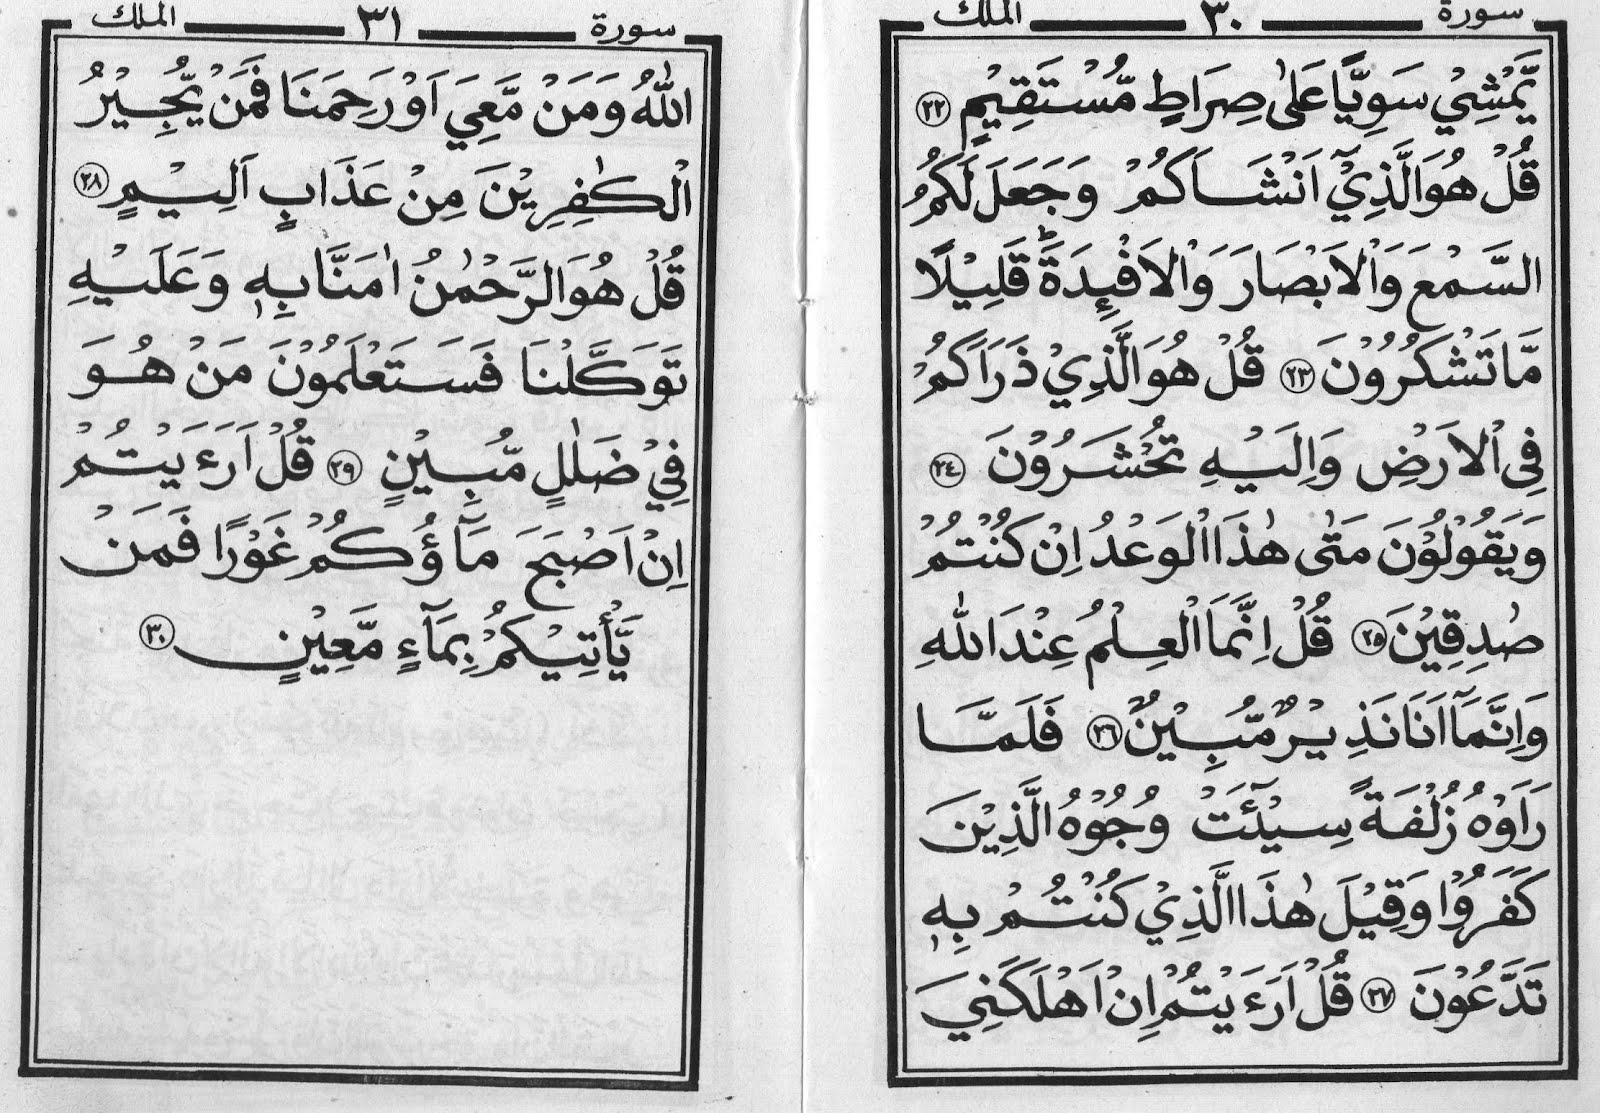 Diposkan oleh mudhofar, S. Pd Akhmad di 19.16